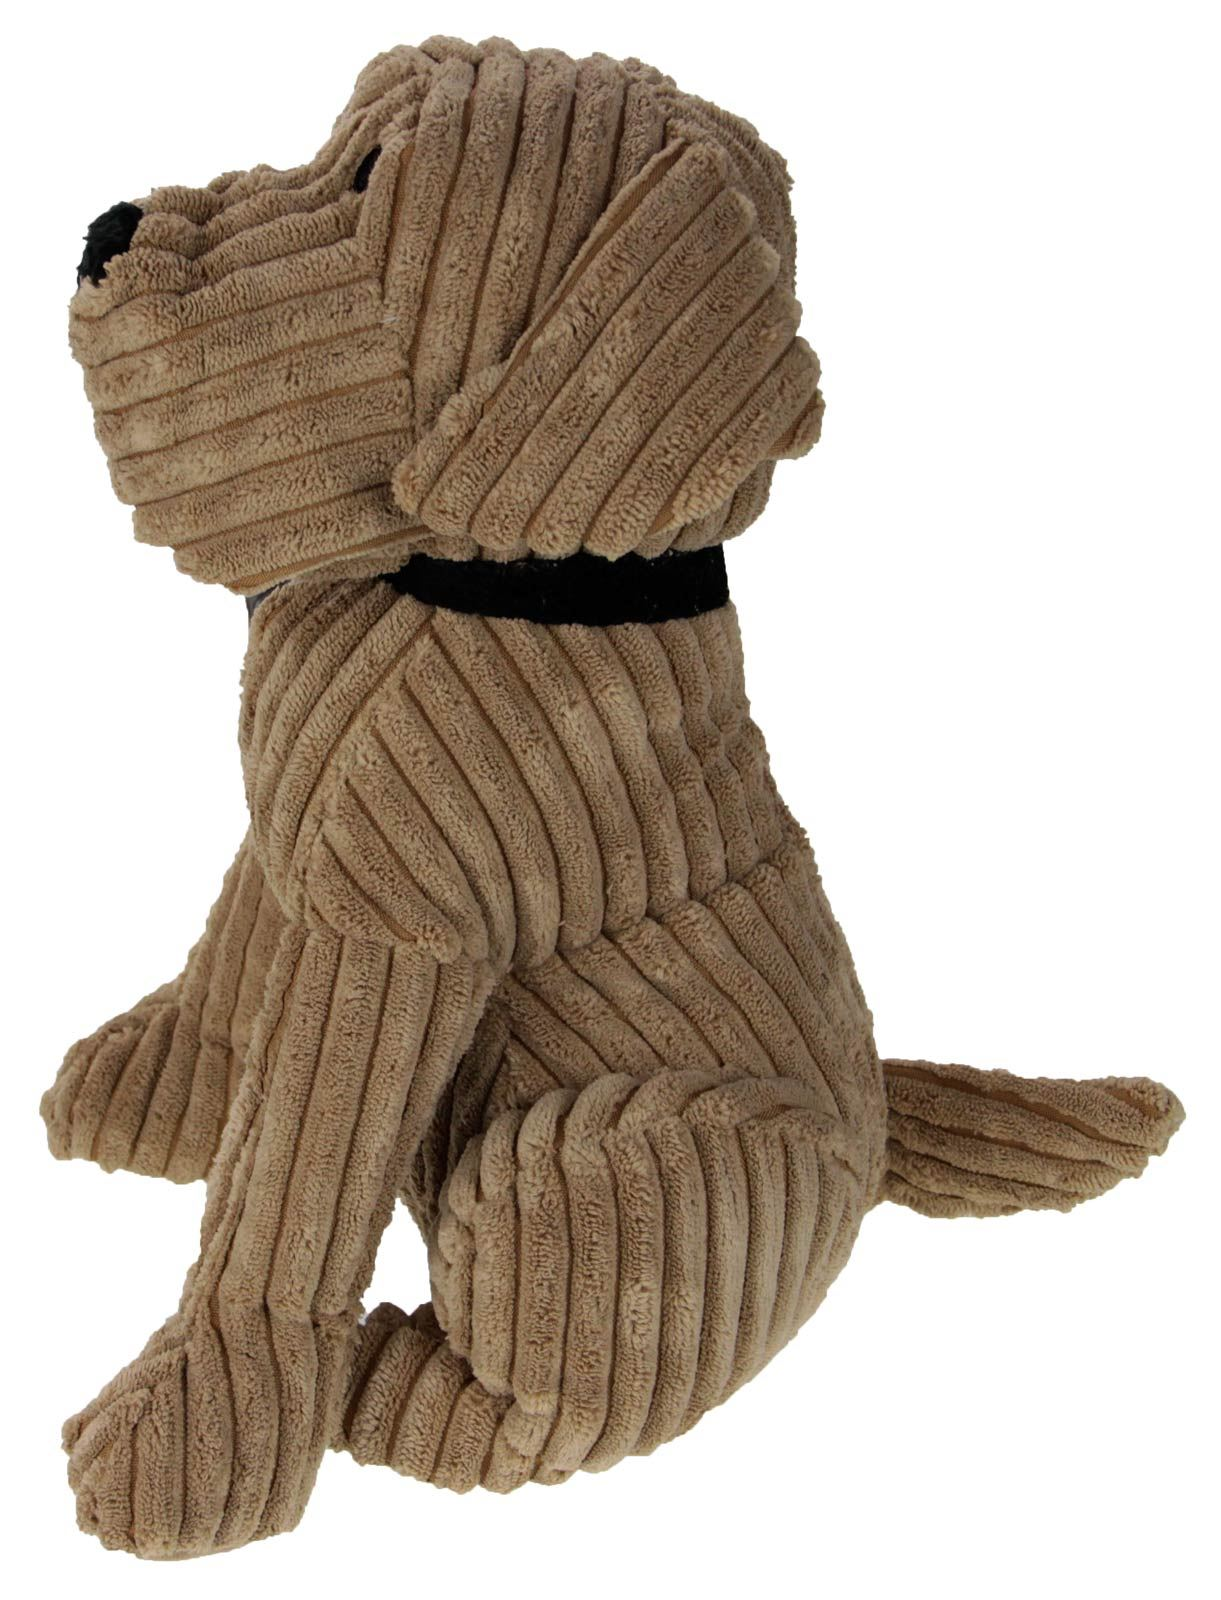 Puppy Doggy Fabric Door Stop Luxury Heavy Duty Stopper Tan